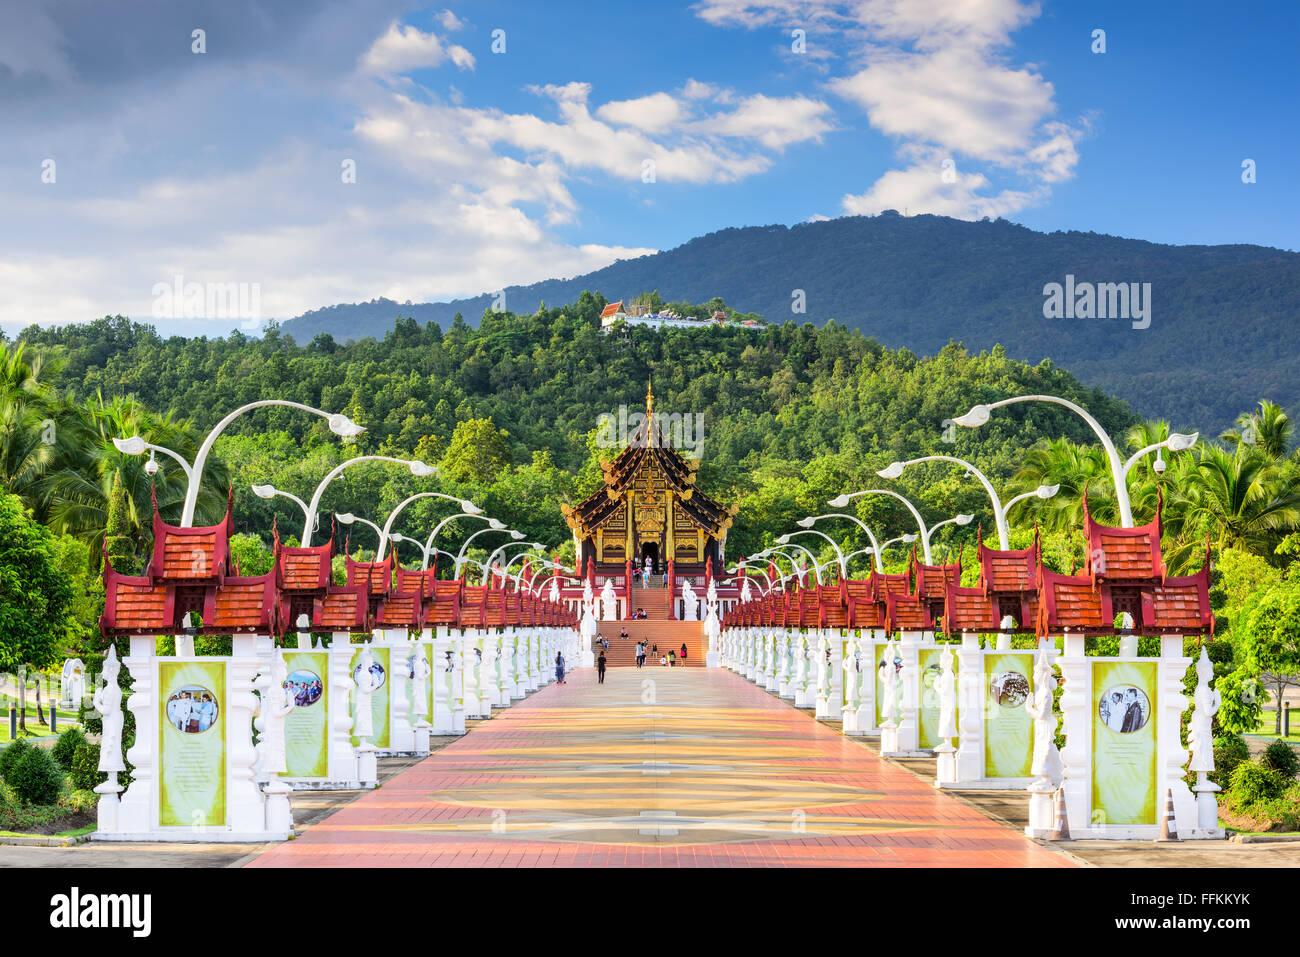 CHIANG MAI, THAILAND - OCTOBER 15, 2015: Walkway to the Pavilion of Royal Flora Ratchaphruek Park. - Stock Image